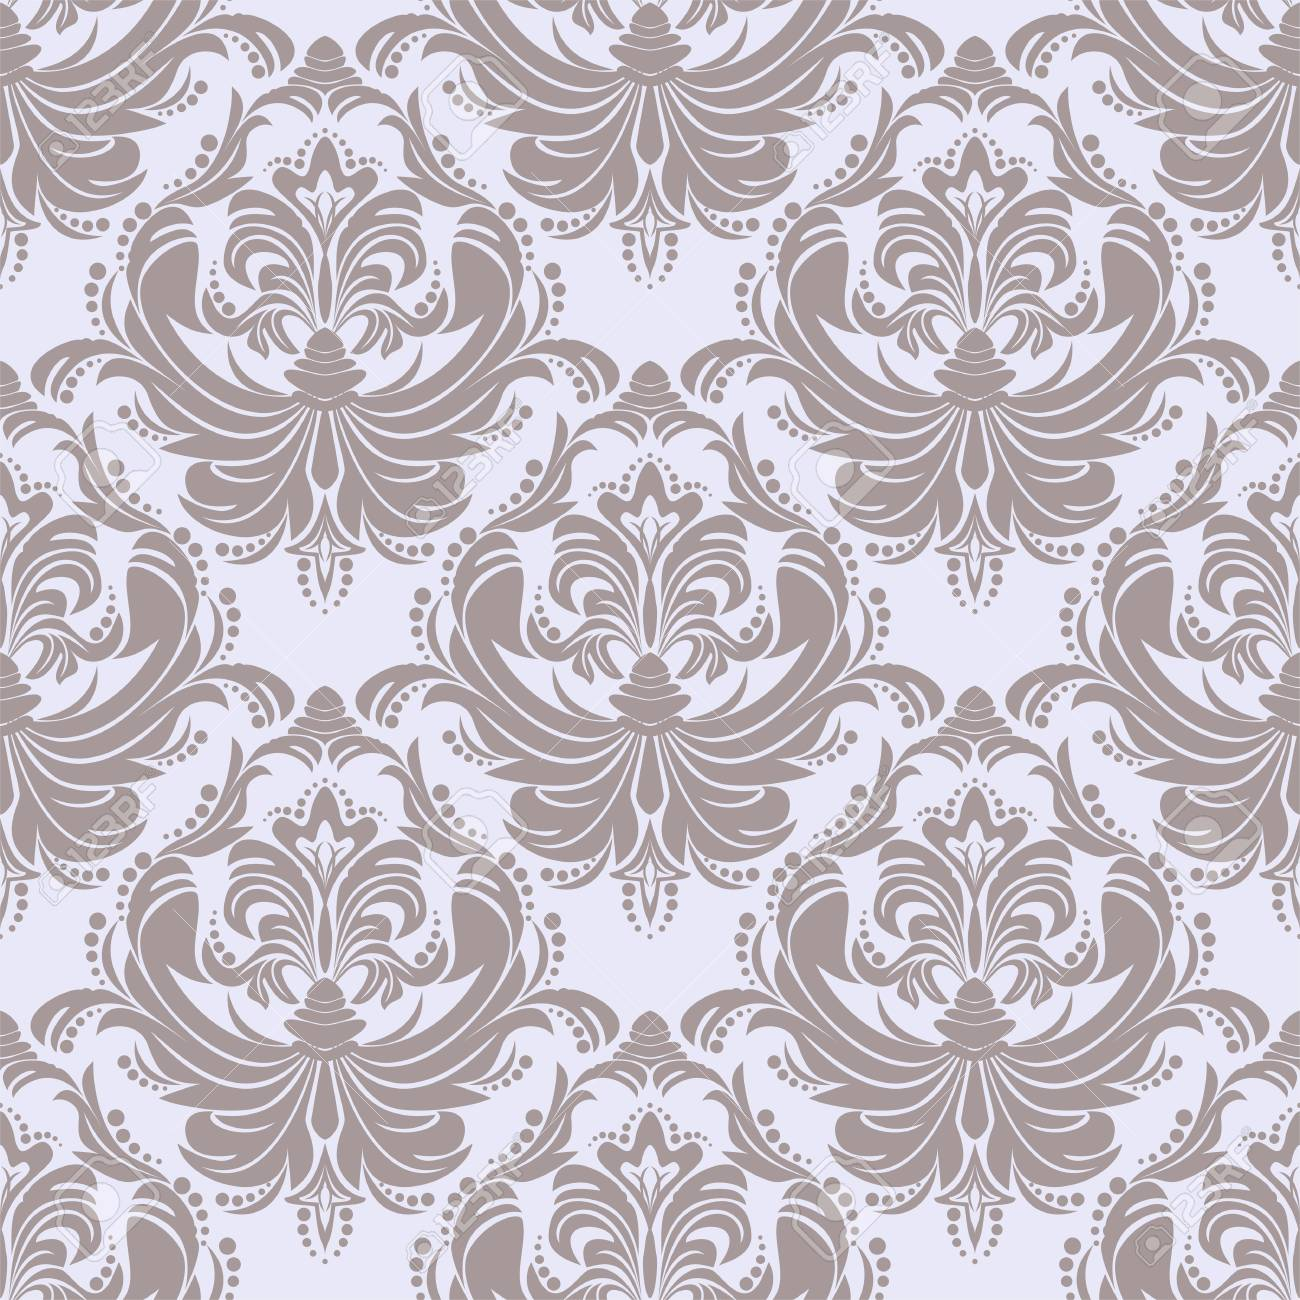 Seamless retro damask Wallpaper for Design - 103610139